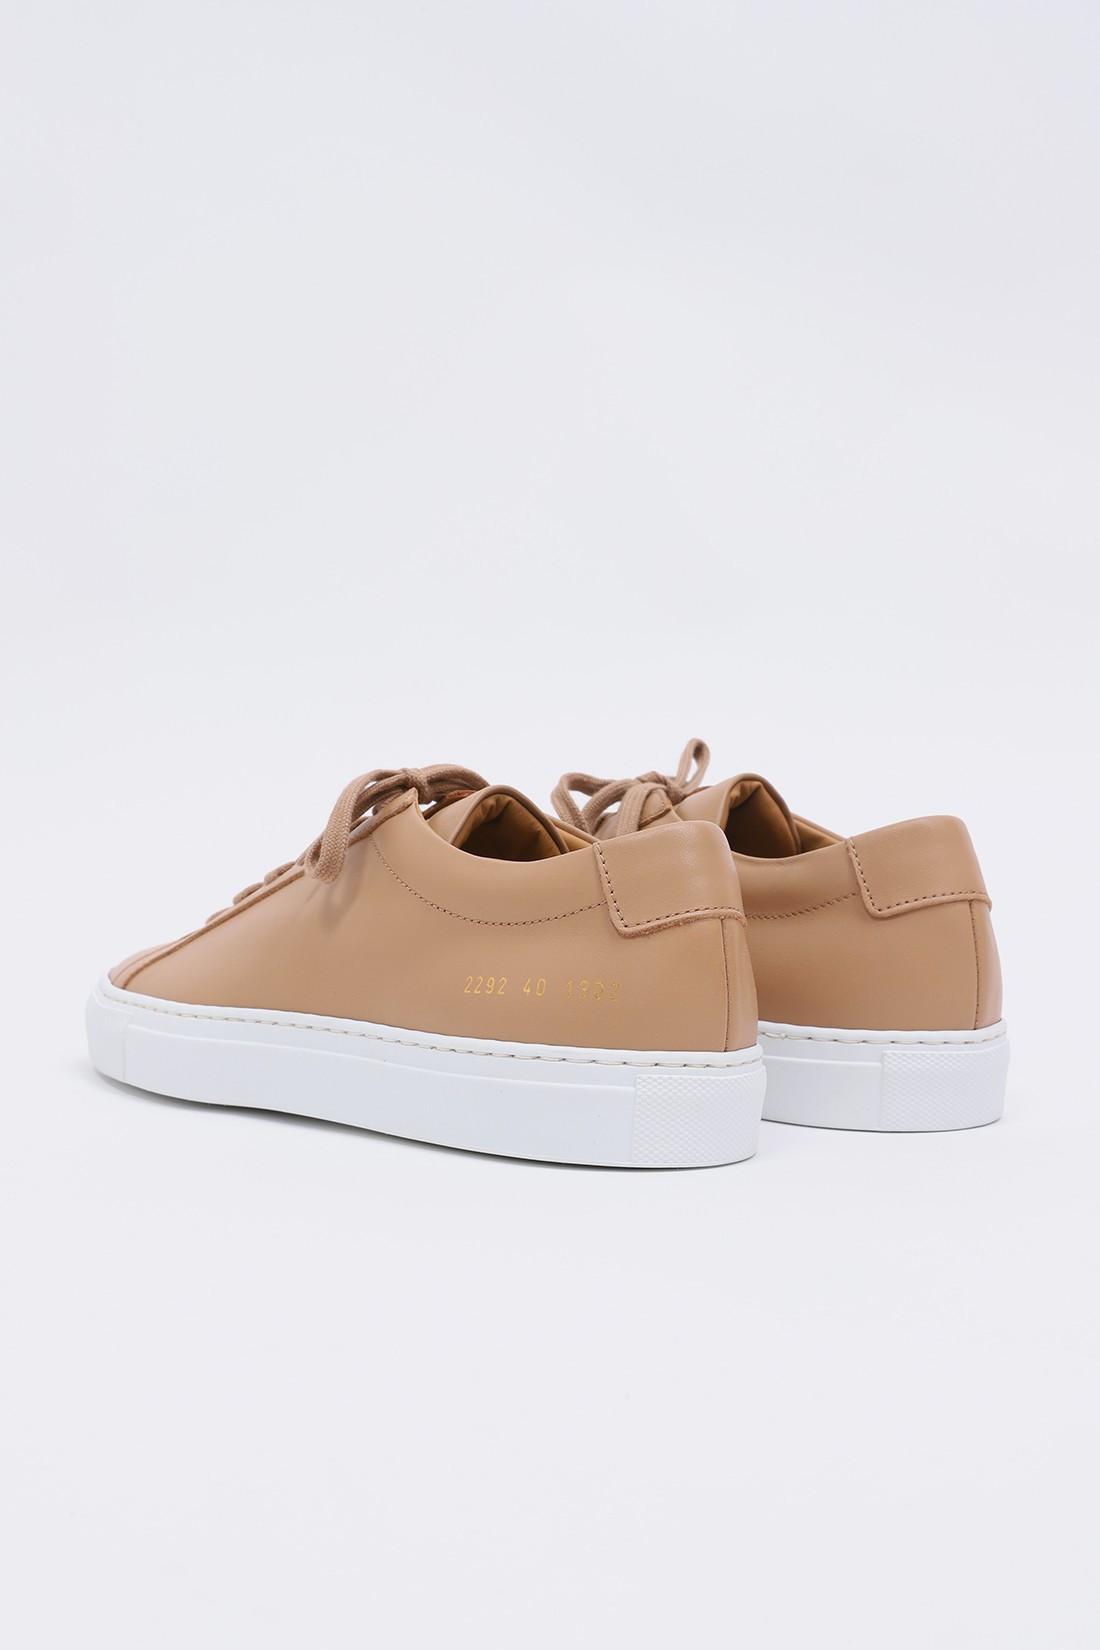 COMMON PROJECTS / Achilles white sole 2292 Tan